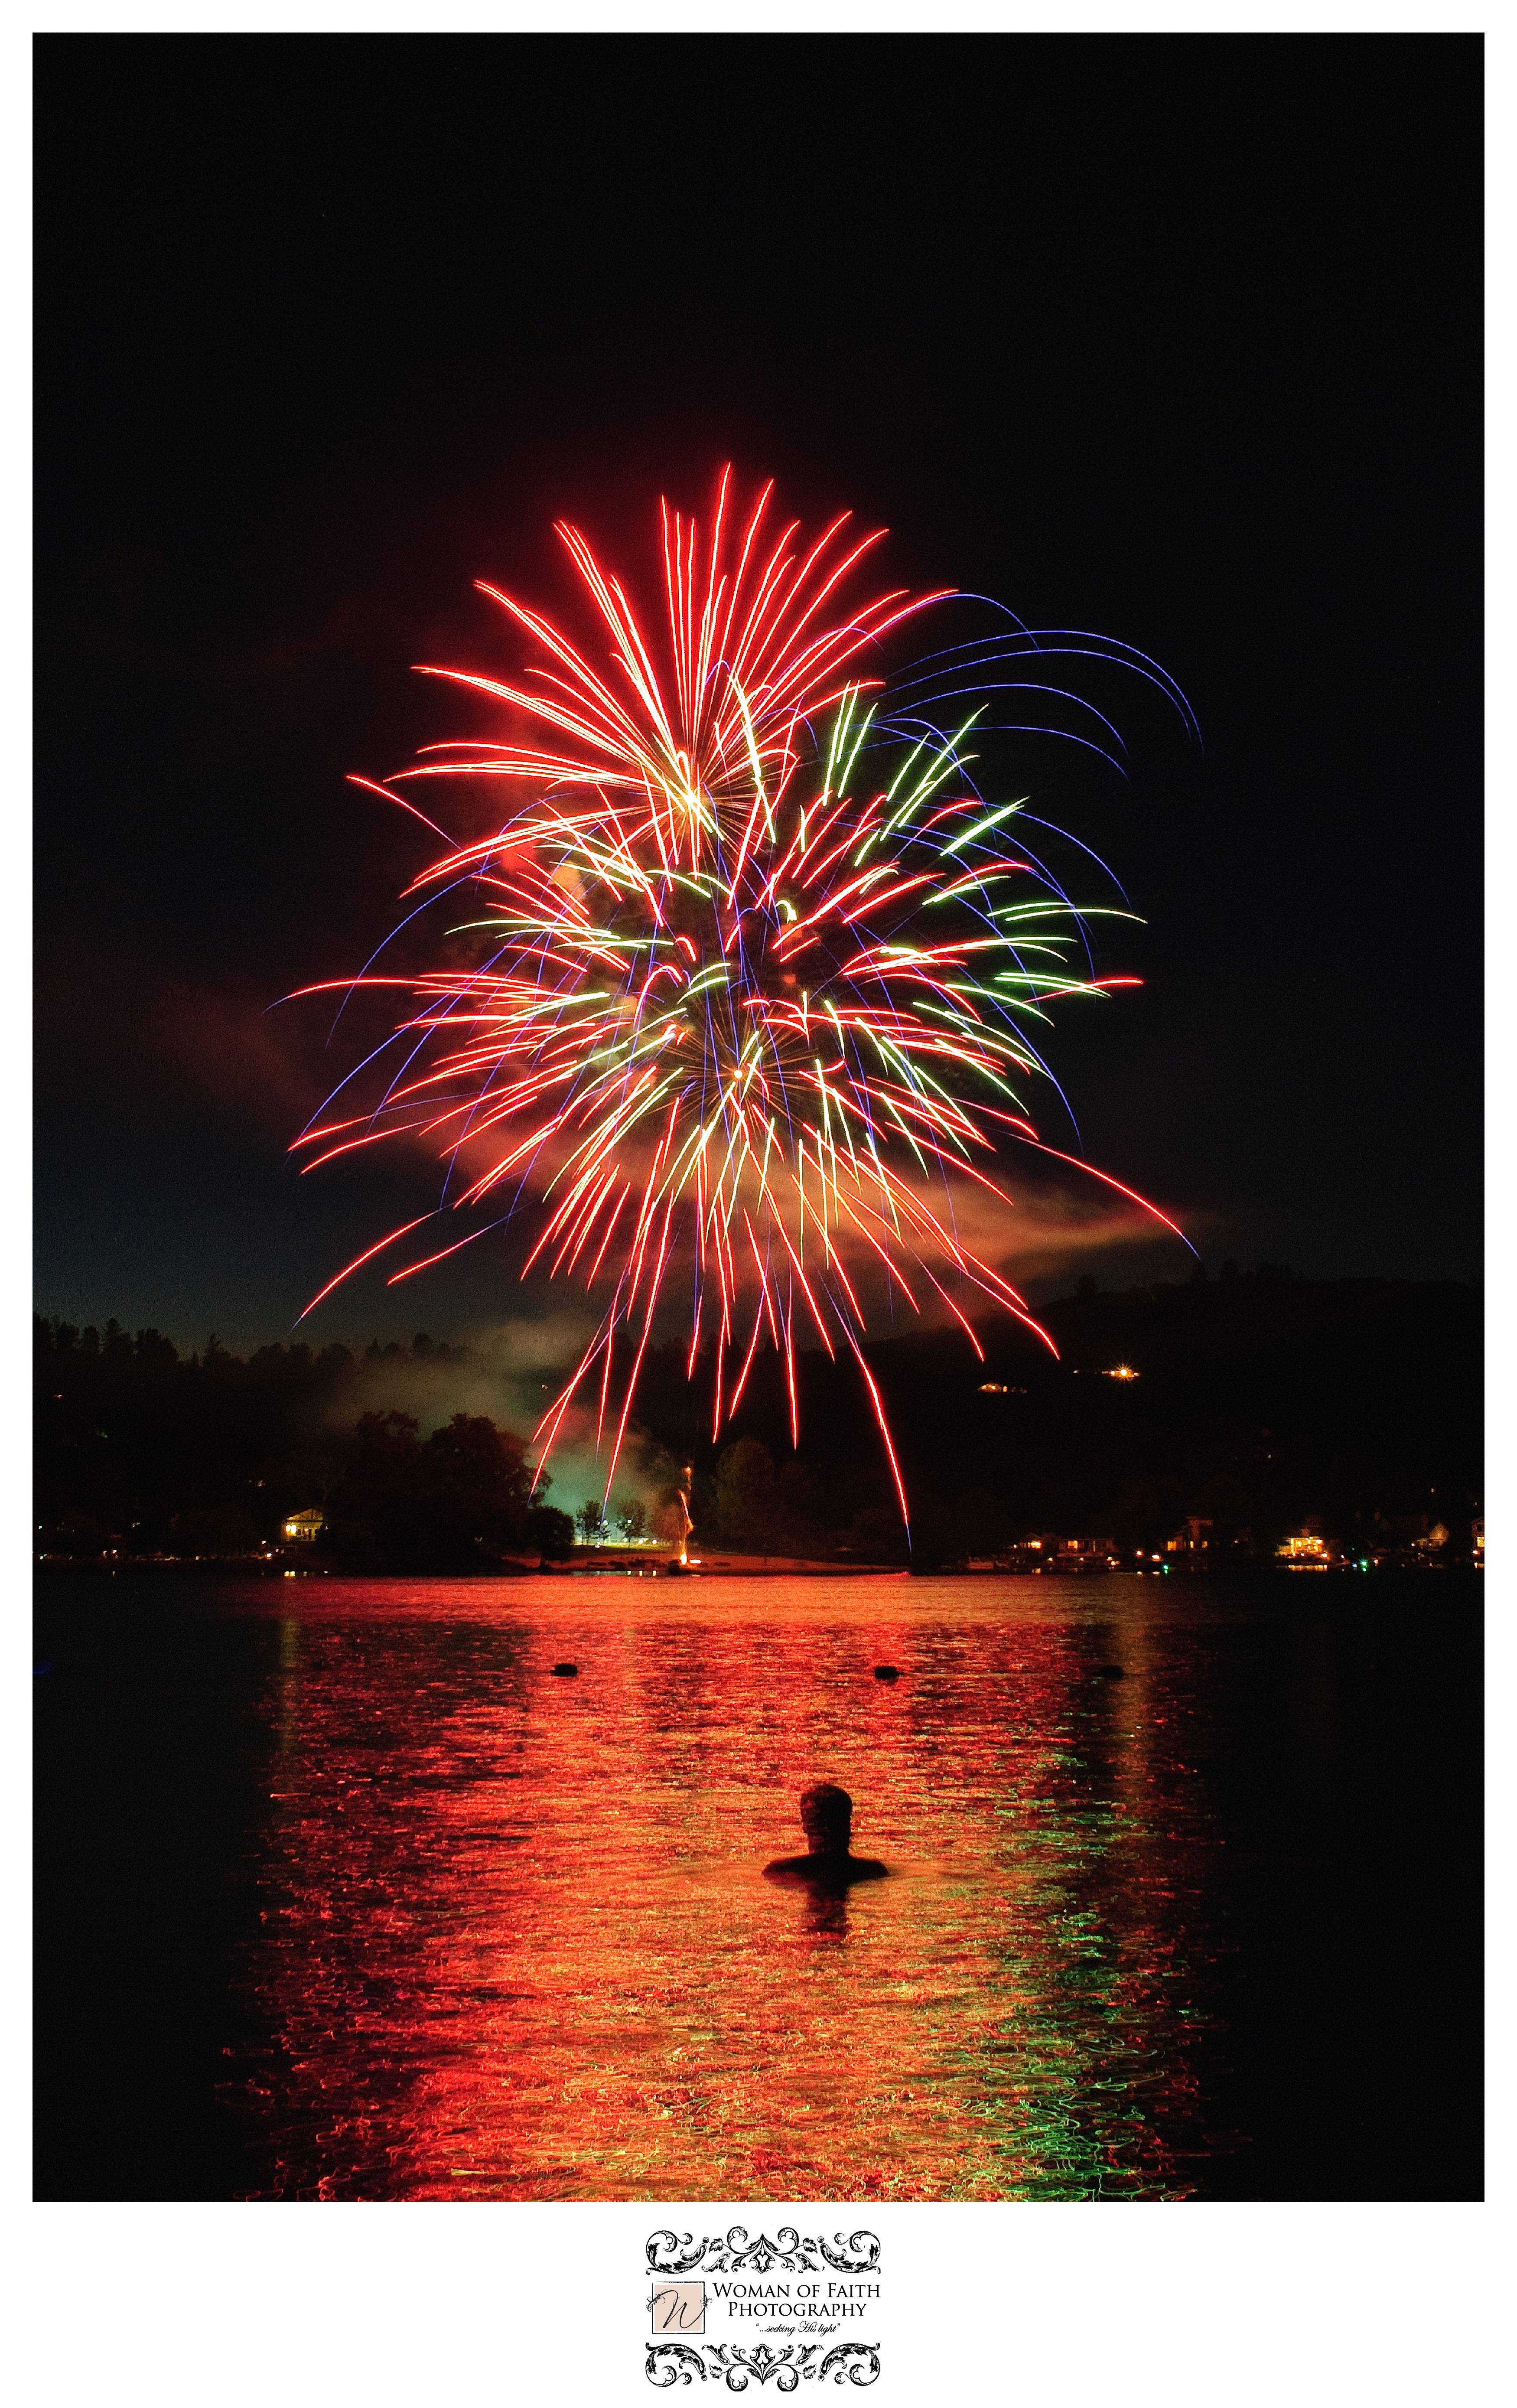 Lake Wildwood Christmas Lights 2020 Lake Wildwood fireworks | California travel, Lake, Grass valley